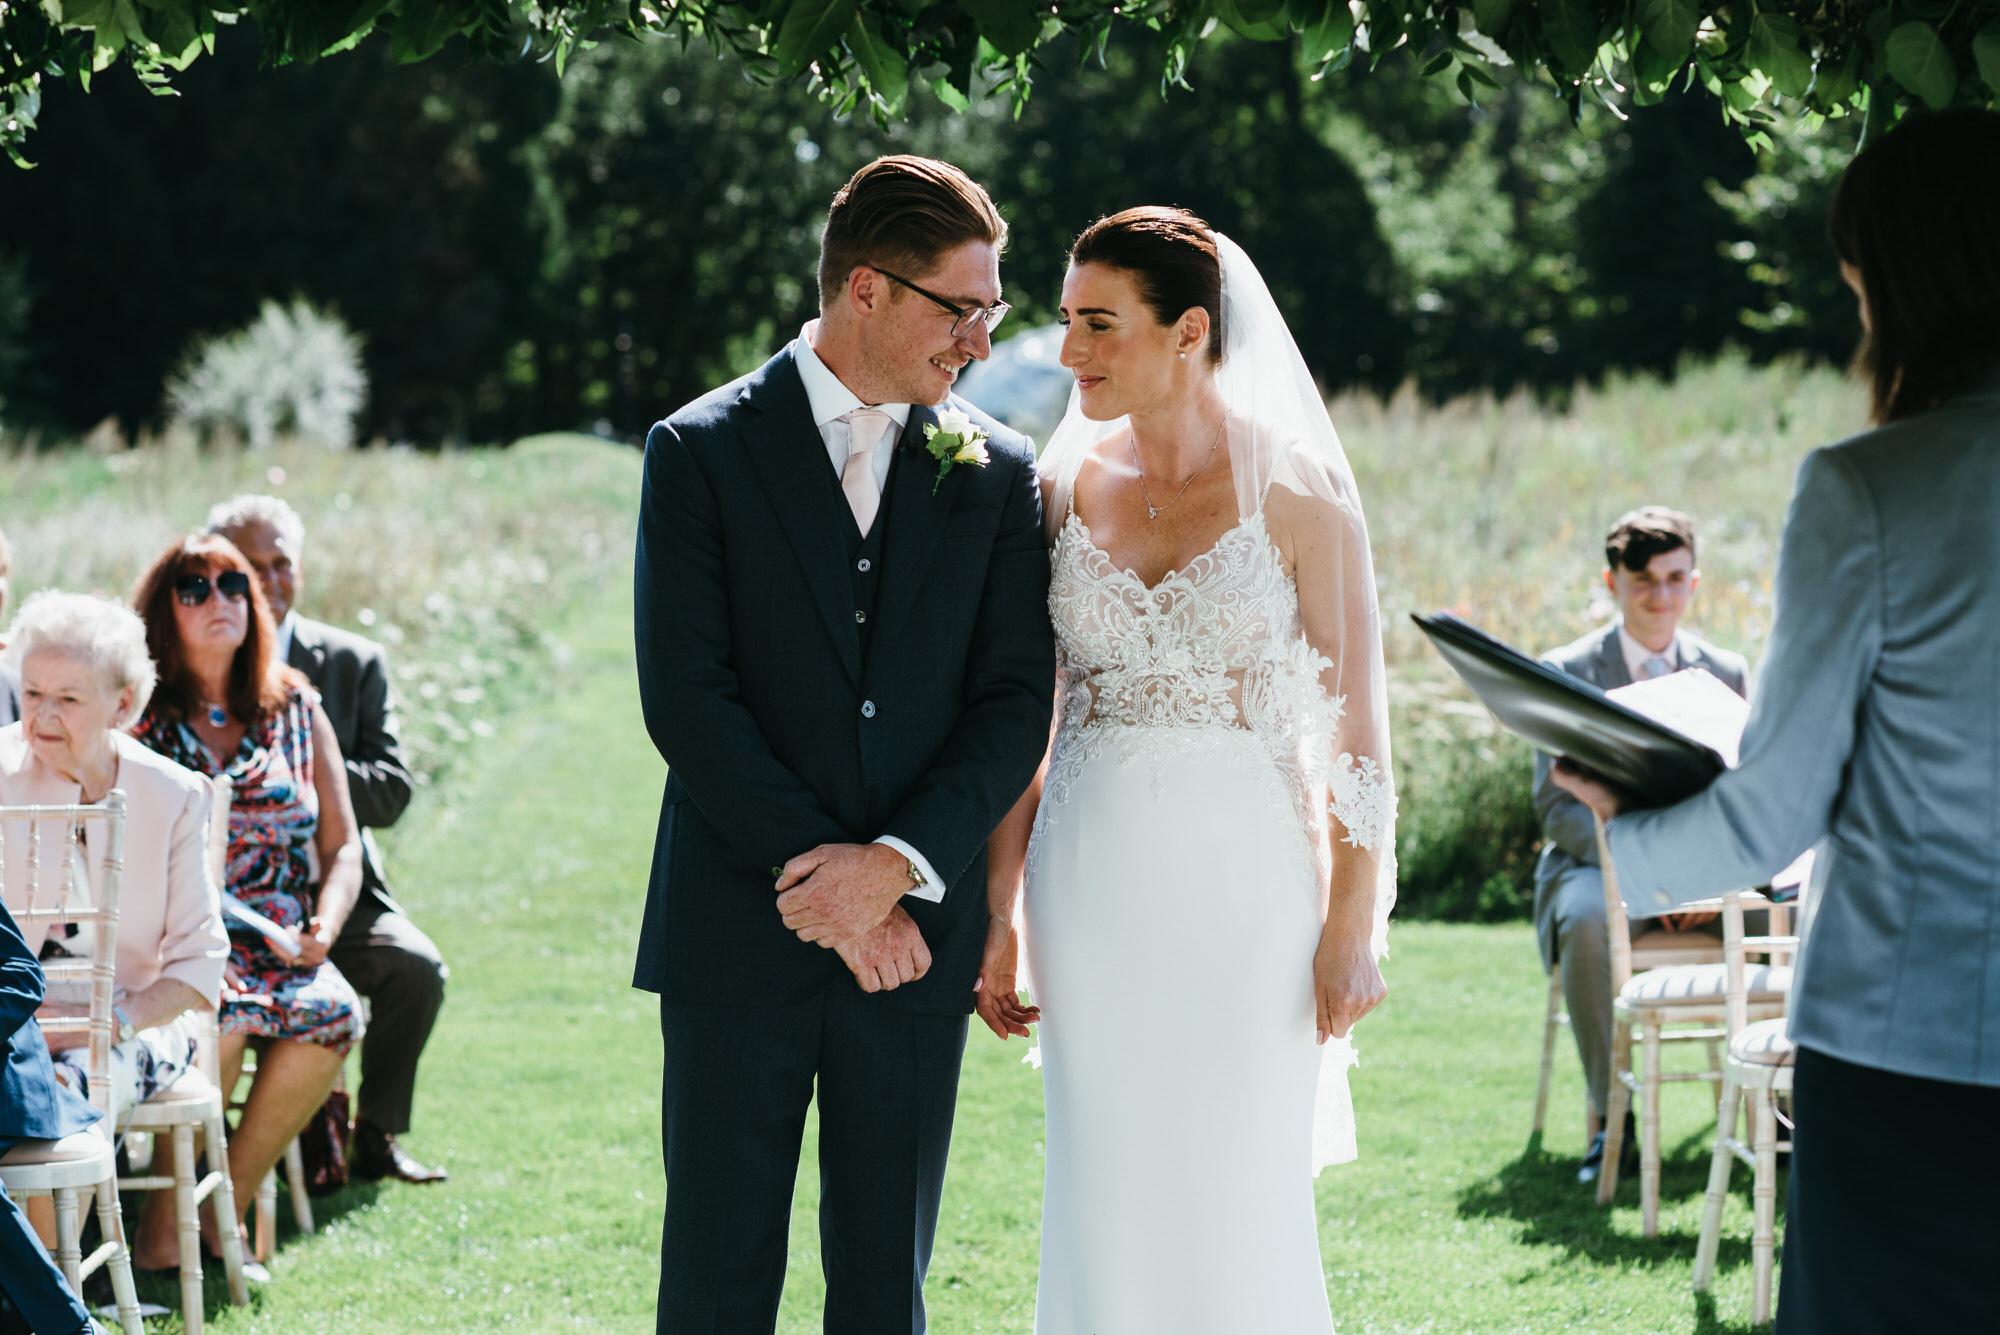 Coworth park wedding in meadow